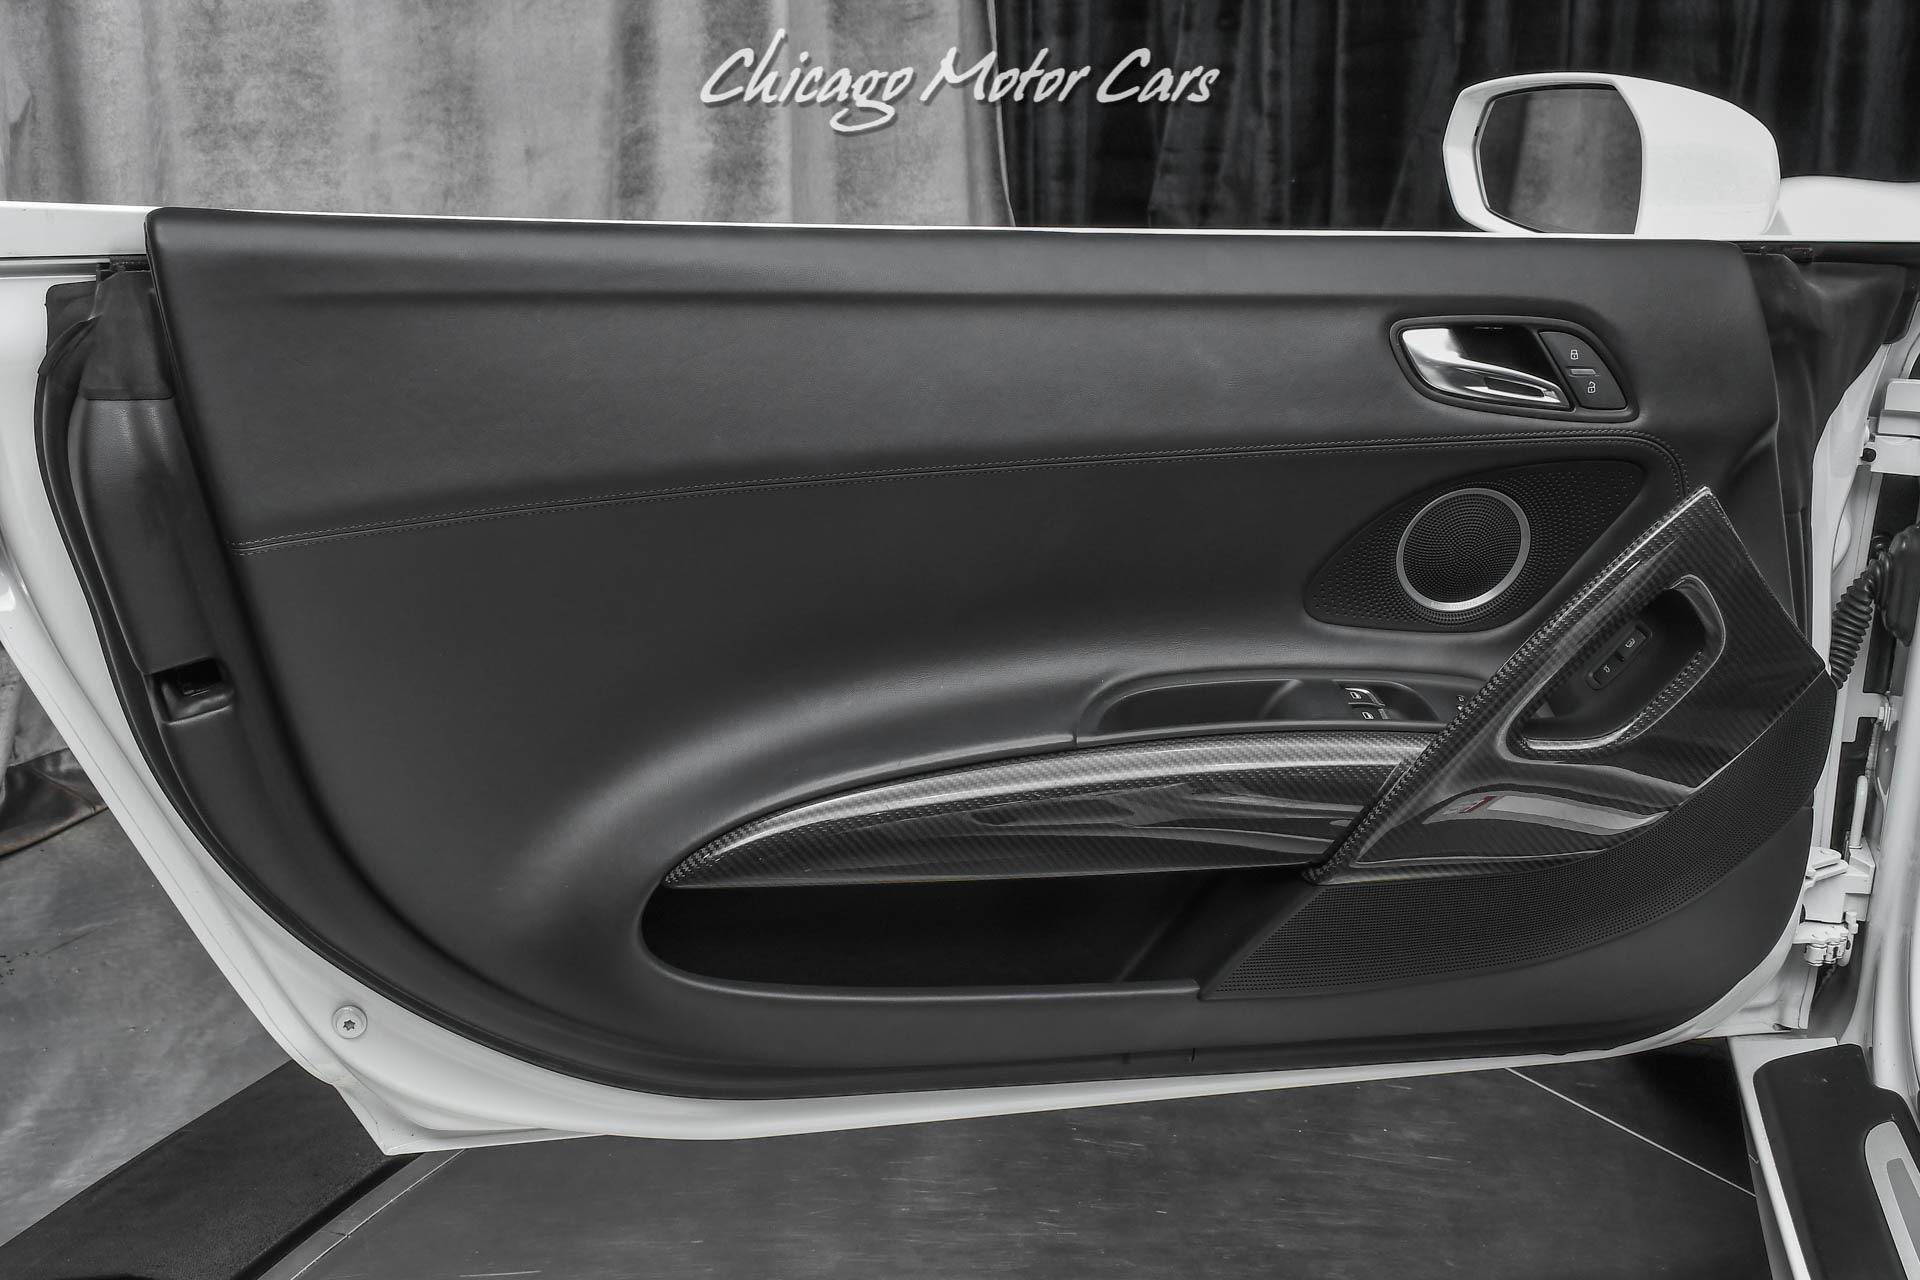 Used-2014-Audi-R8-52-V10-Quattro-Spyder-FULL-LEATHER-PKG-CARBON-SIGMA-INLAYS-SERVICED